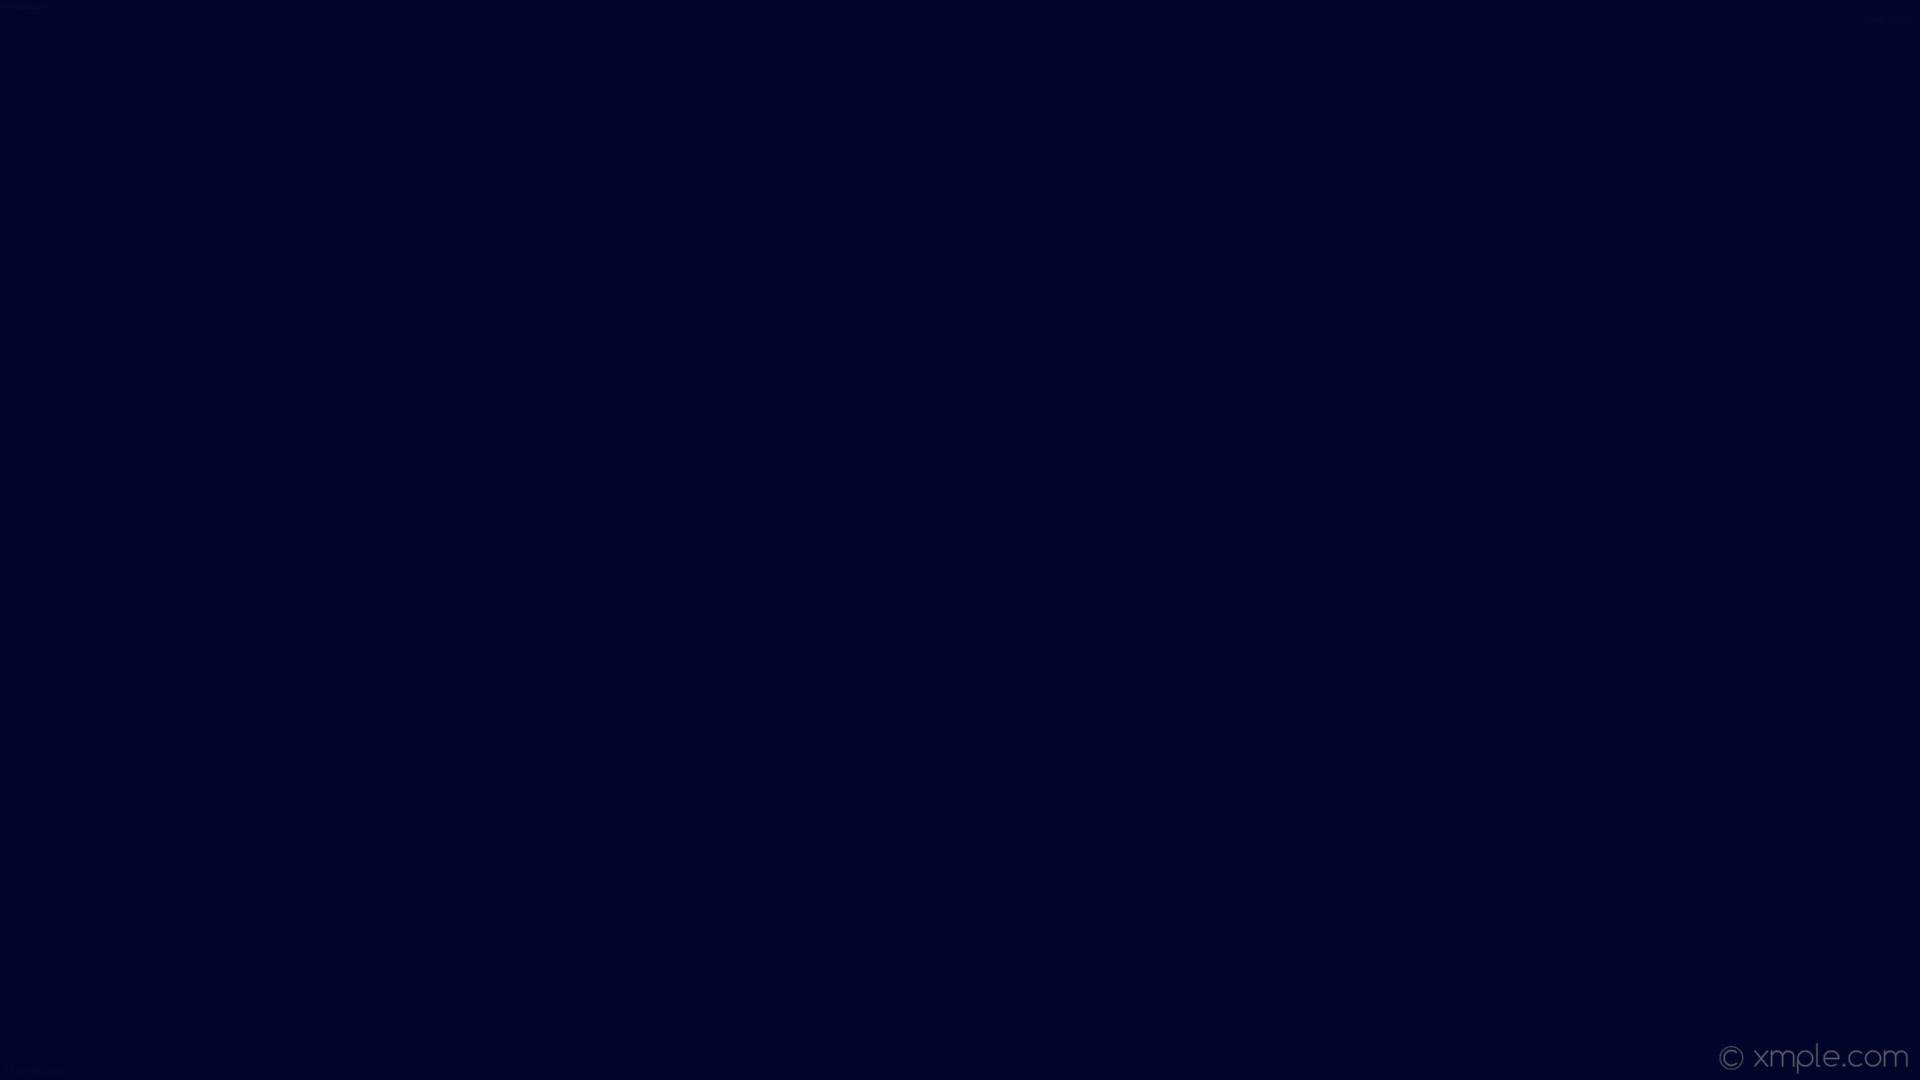 1920x1080 Wallpaper Solid Color One Colour Single Blue Plain Dark 070f43